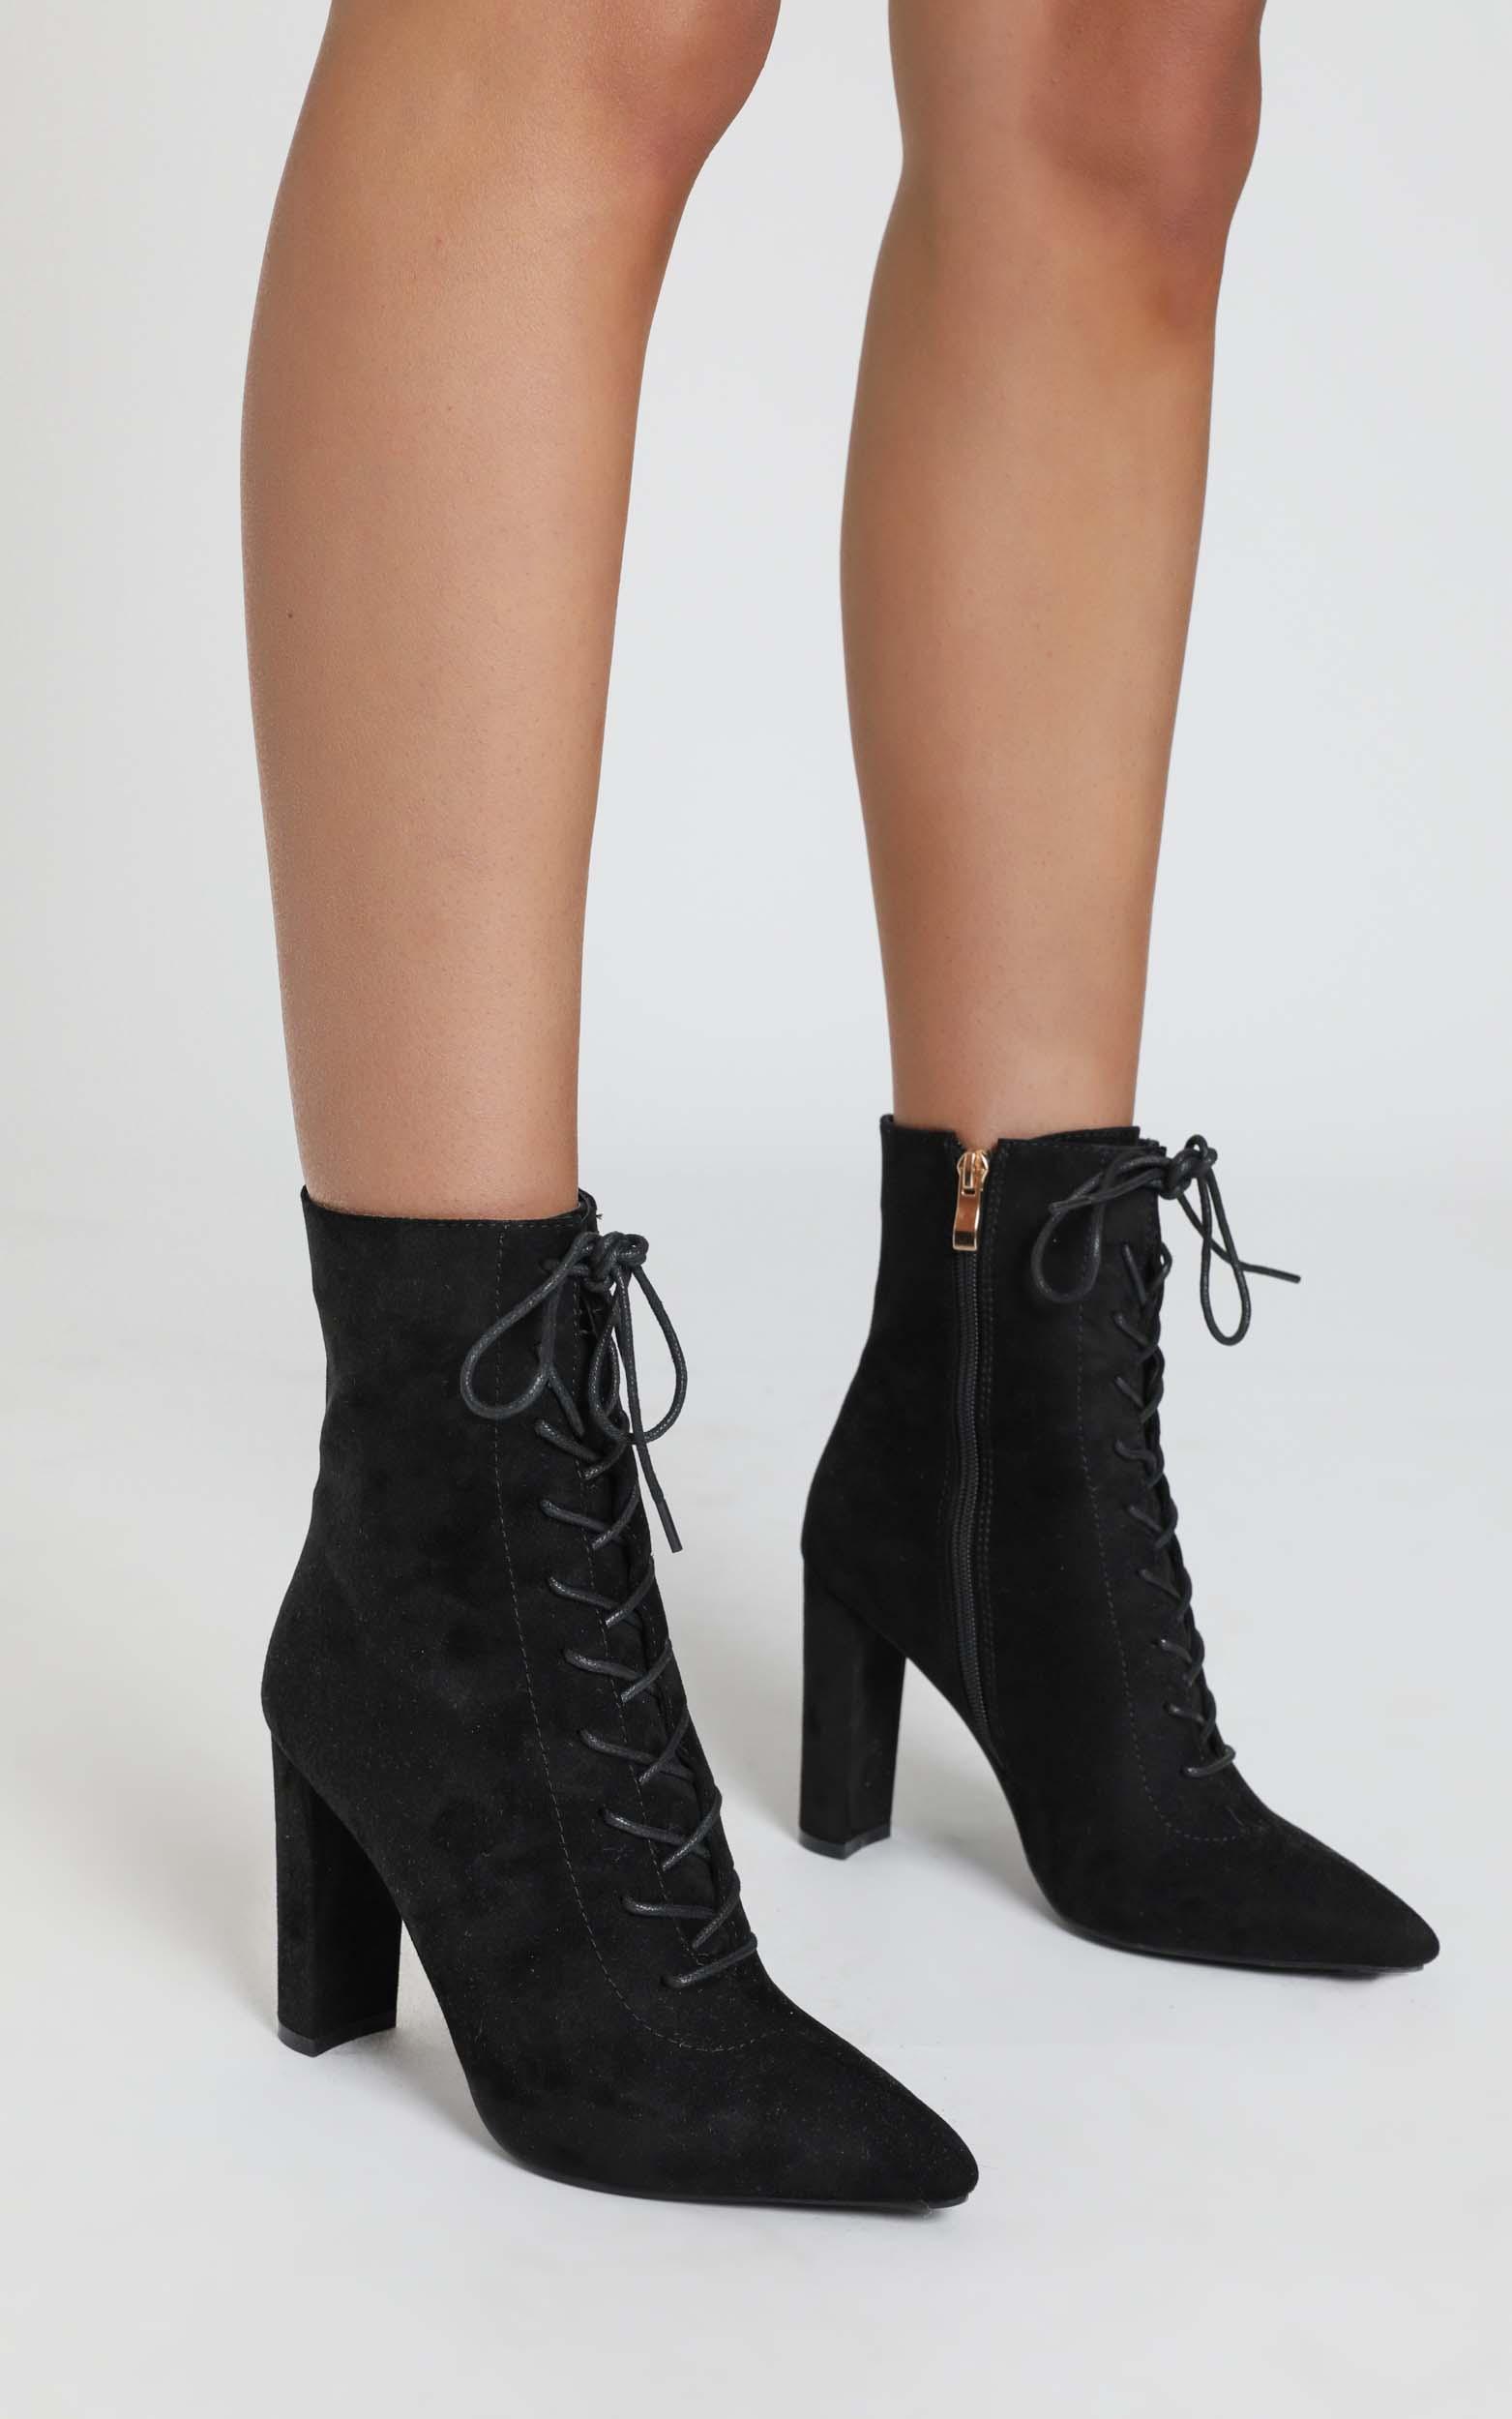 Billini - Kassia Boots in black micro - 5, Black, hi-res image number null